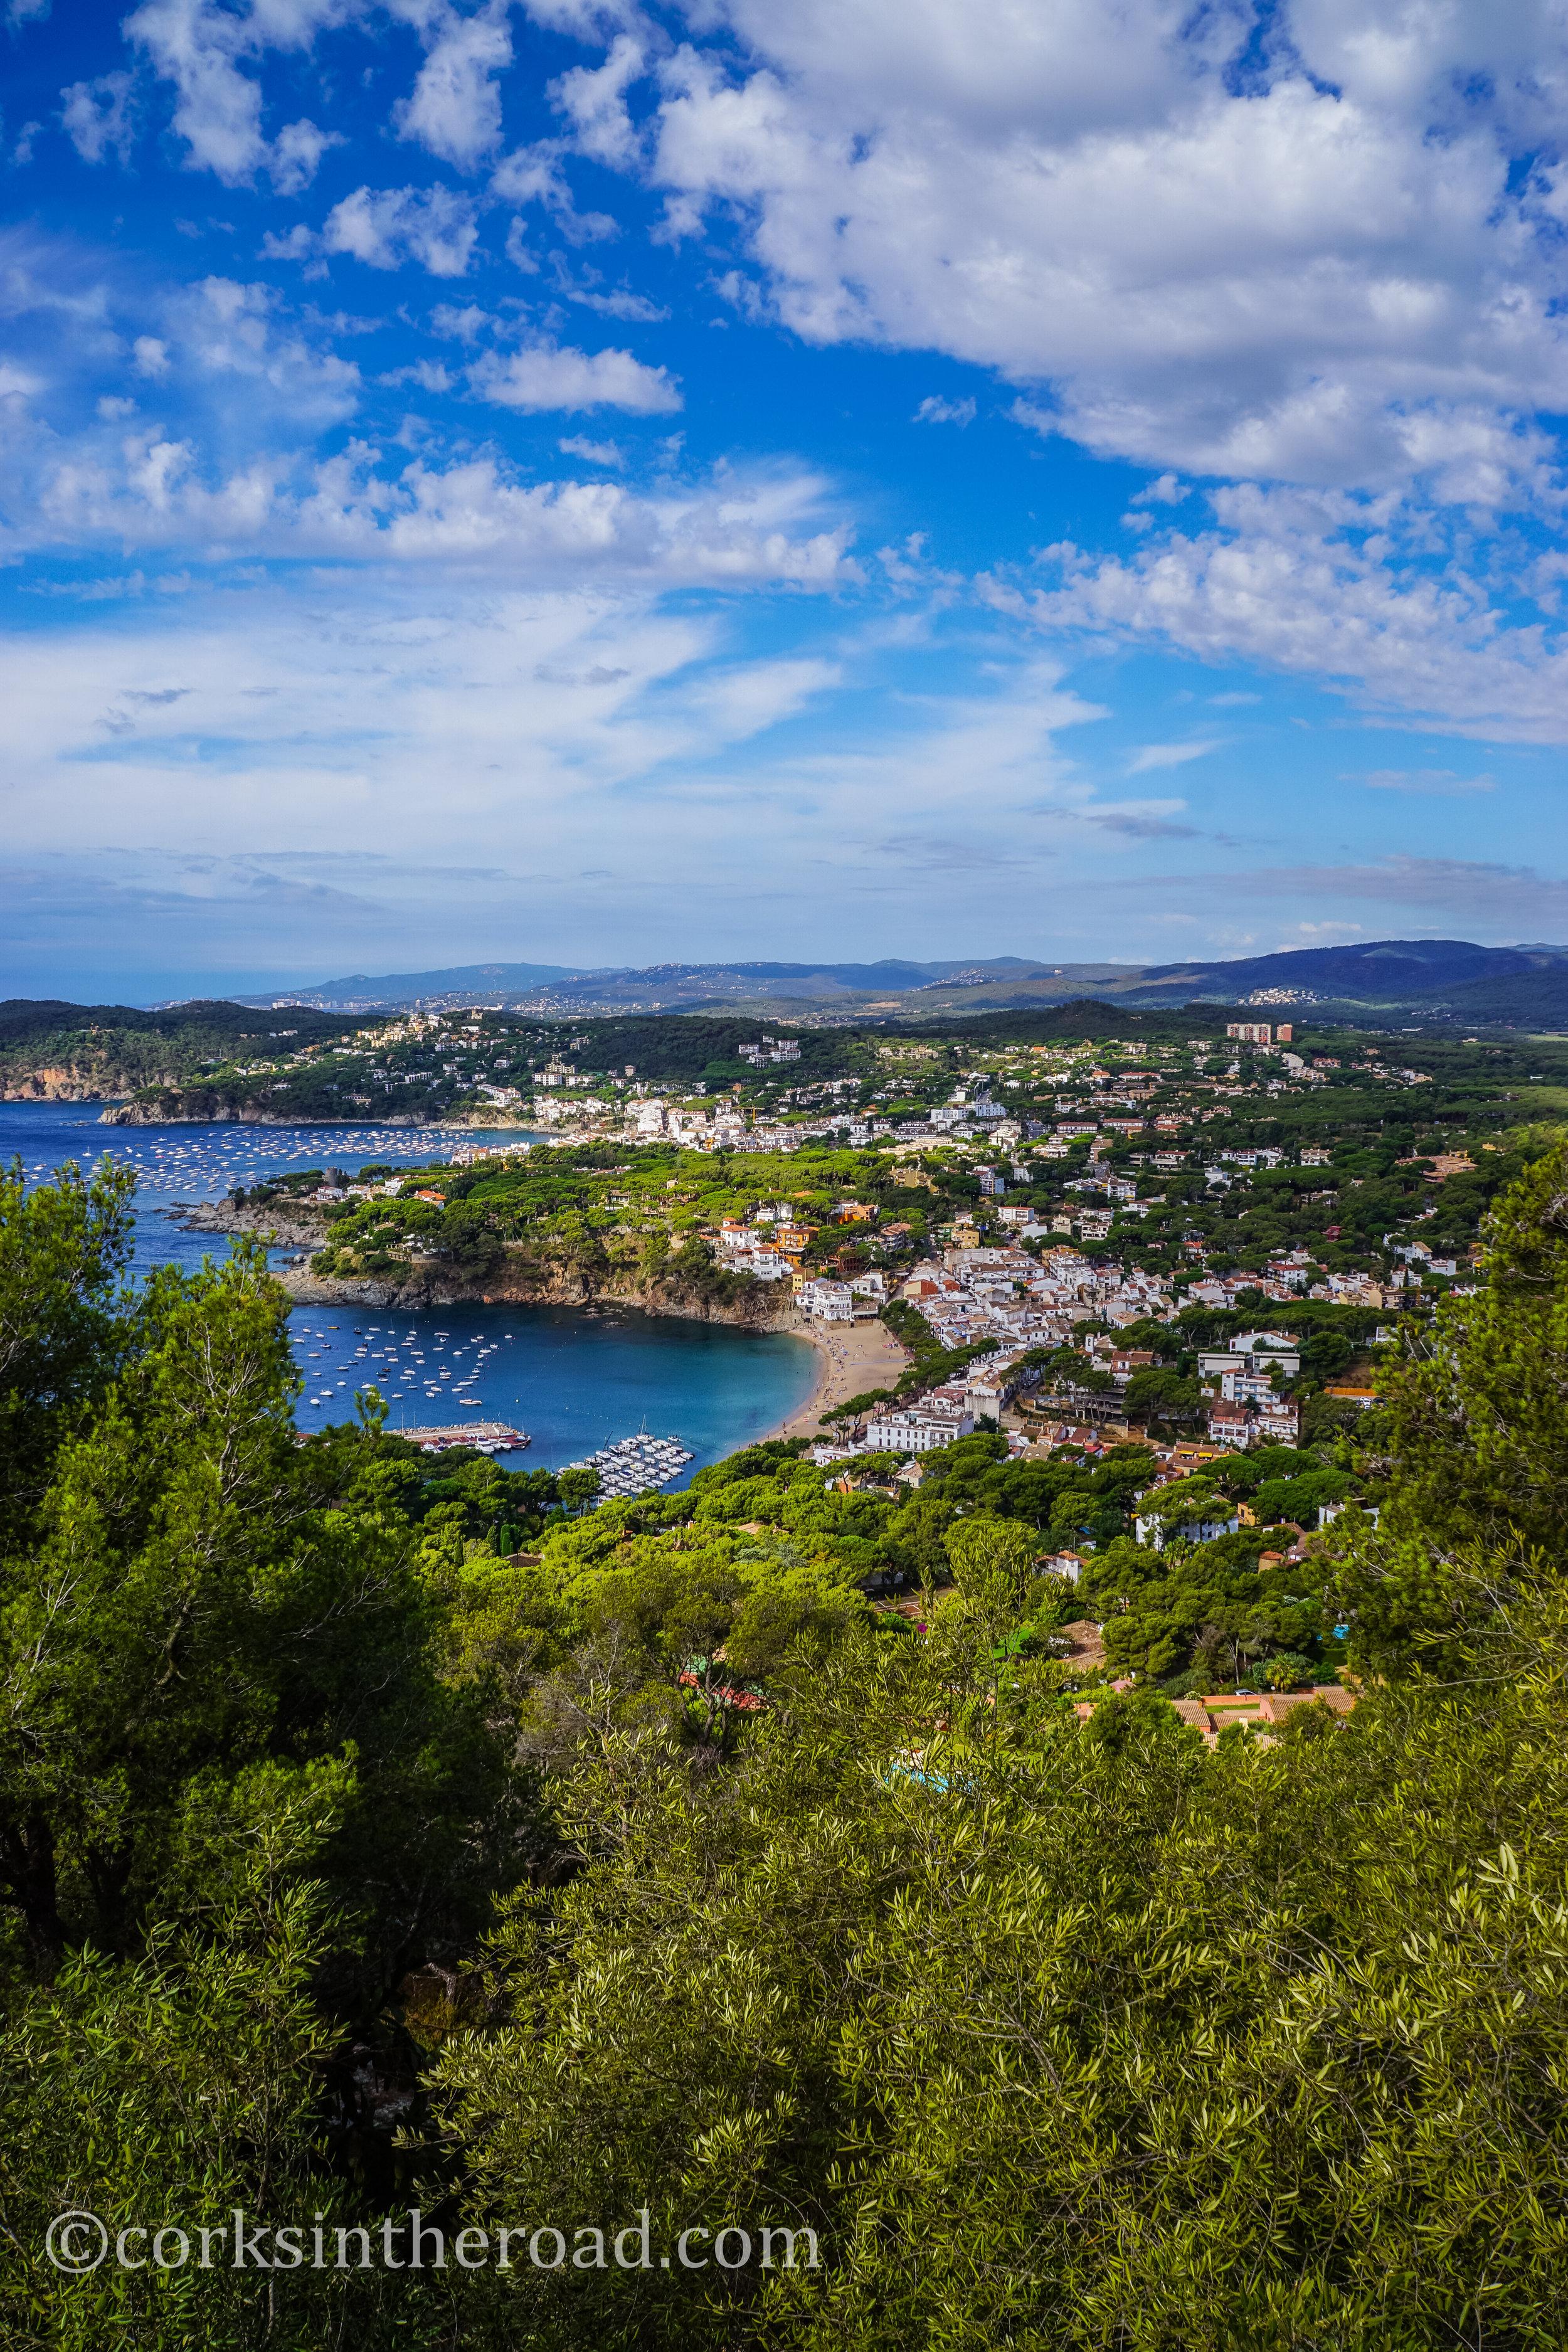 20160810Barcelona, Corksintheroad, Costa Brava, Costa Brava Landscape.jpg